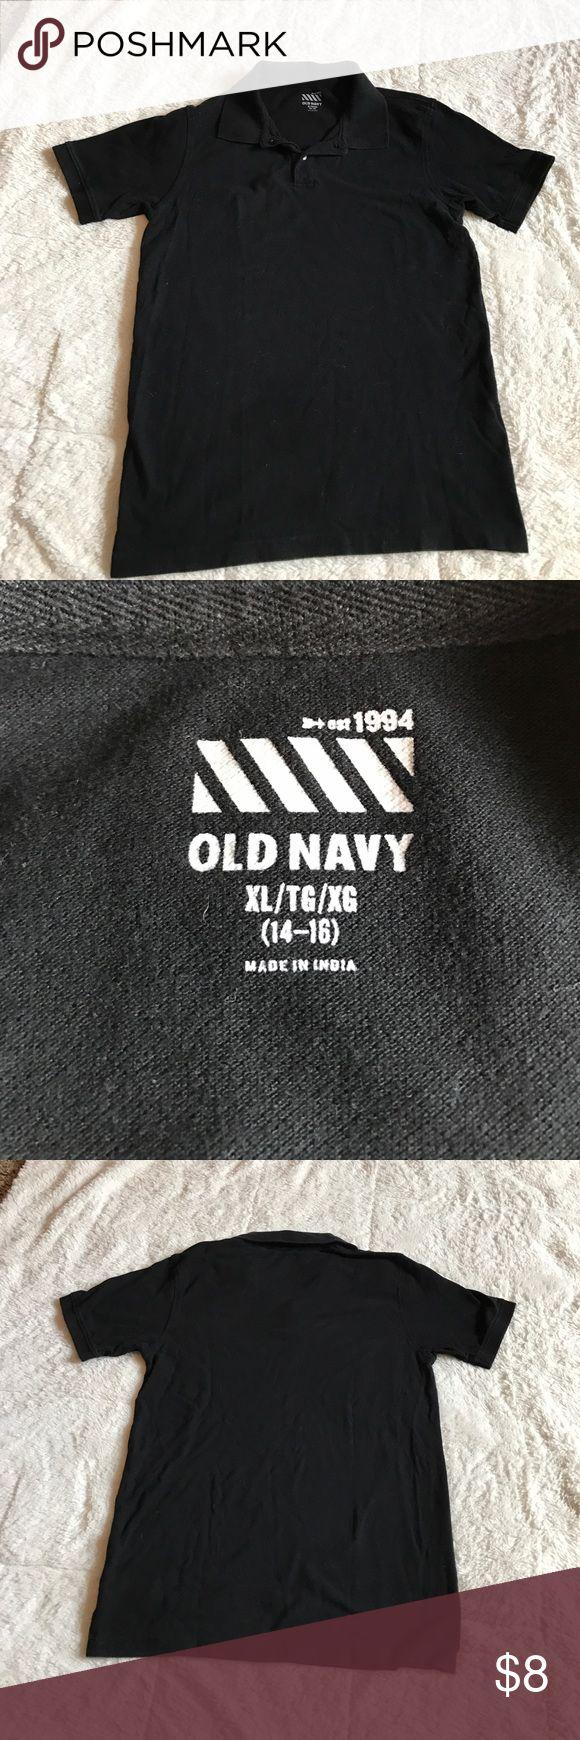 Black t shirt old navy - Boys Old Navy Polo